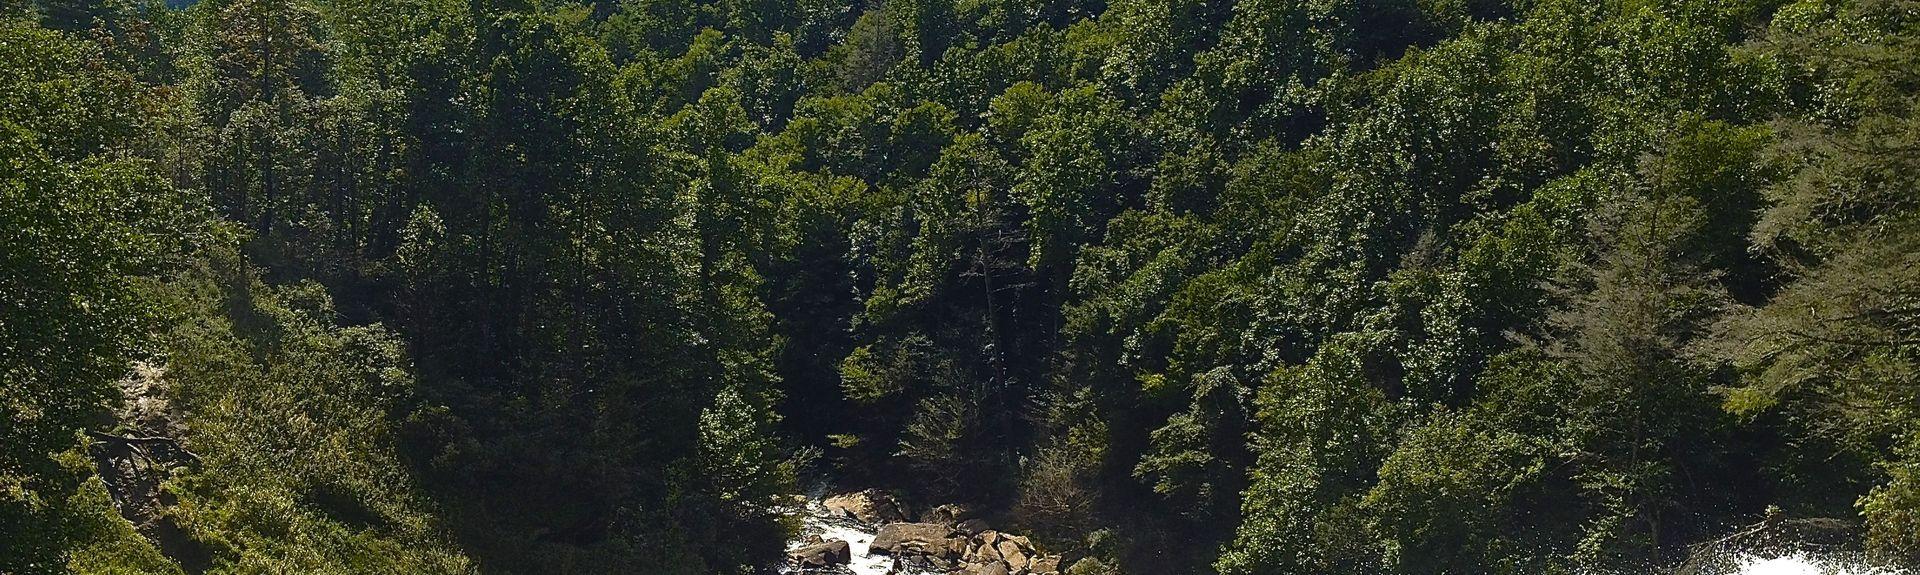 Walhalla, South Carolina, USA